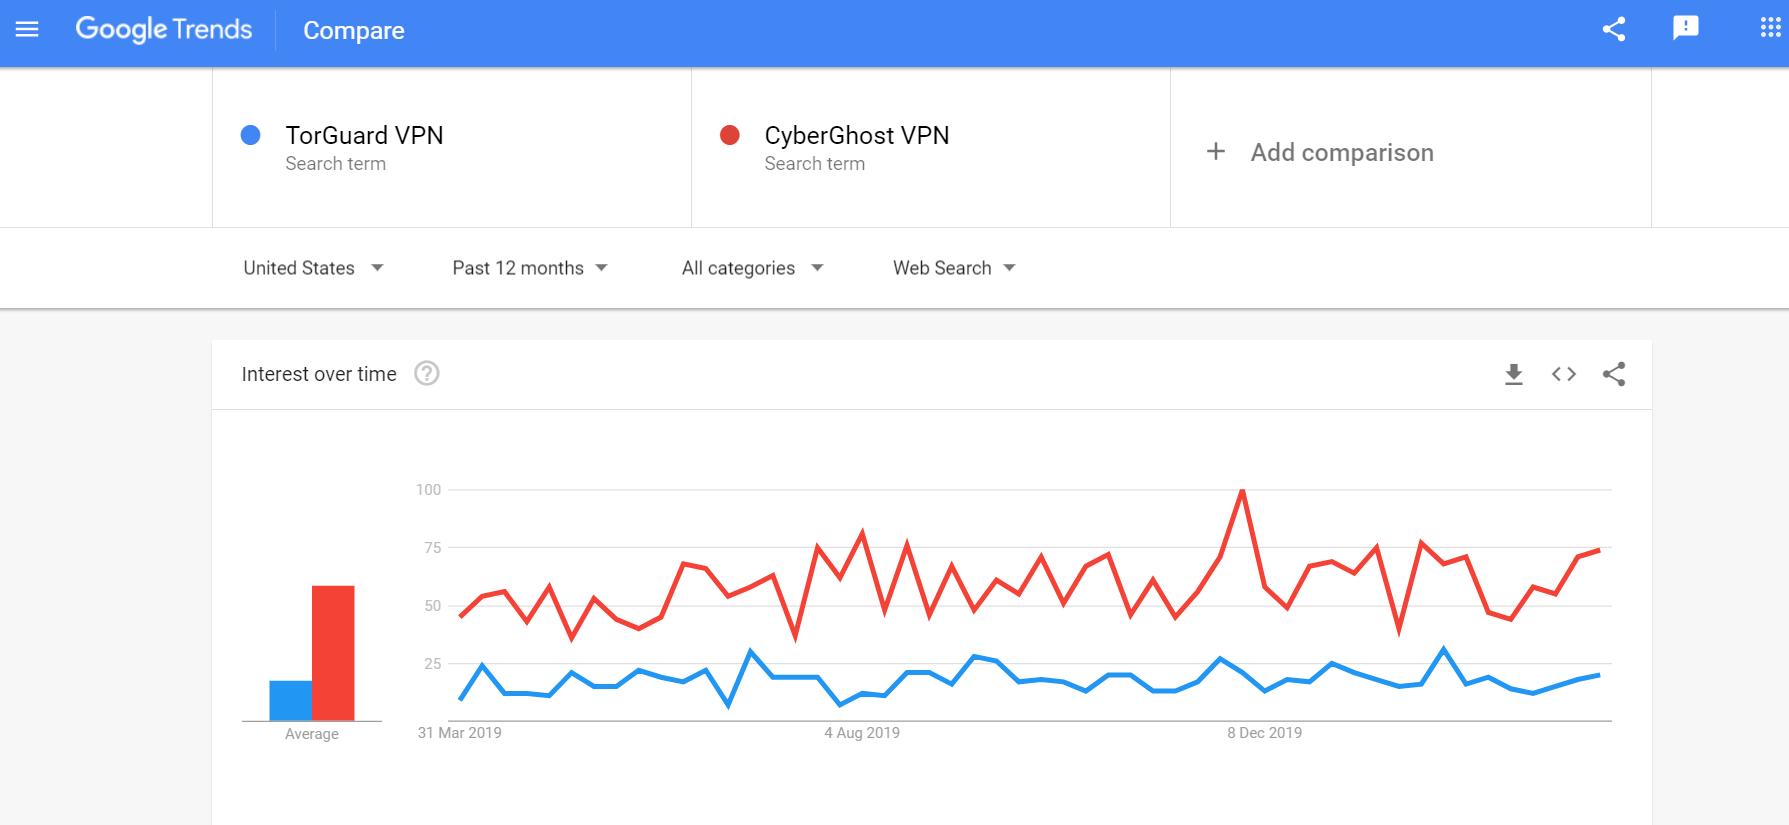 TorGuard vs CyberGhost